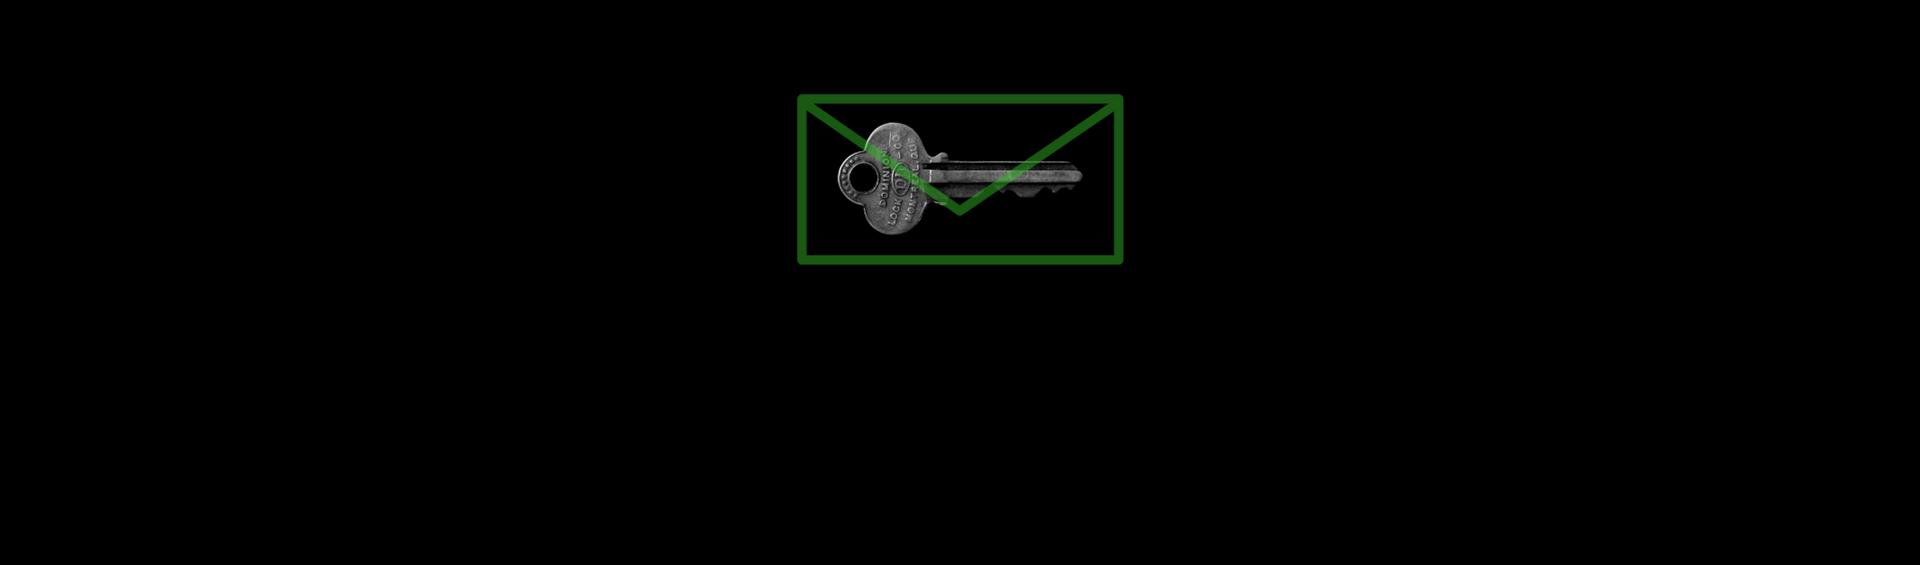 Ключ к теме письма